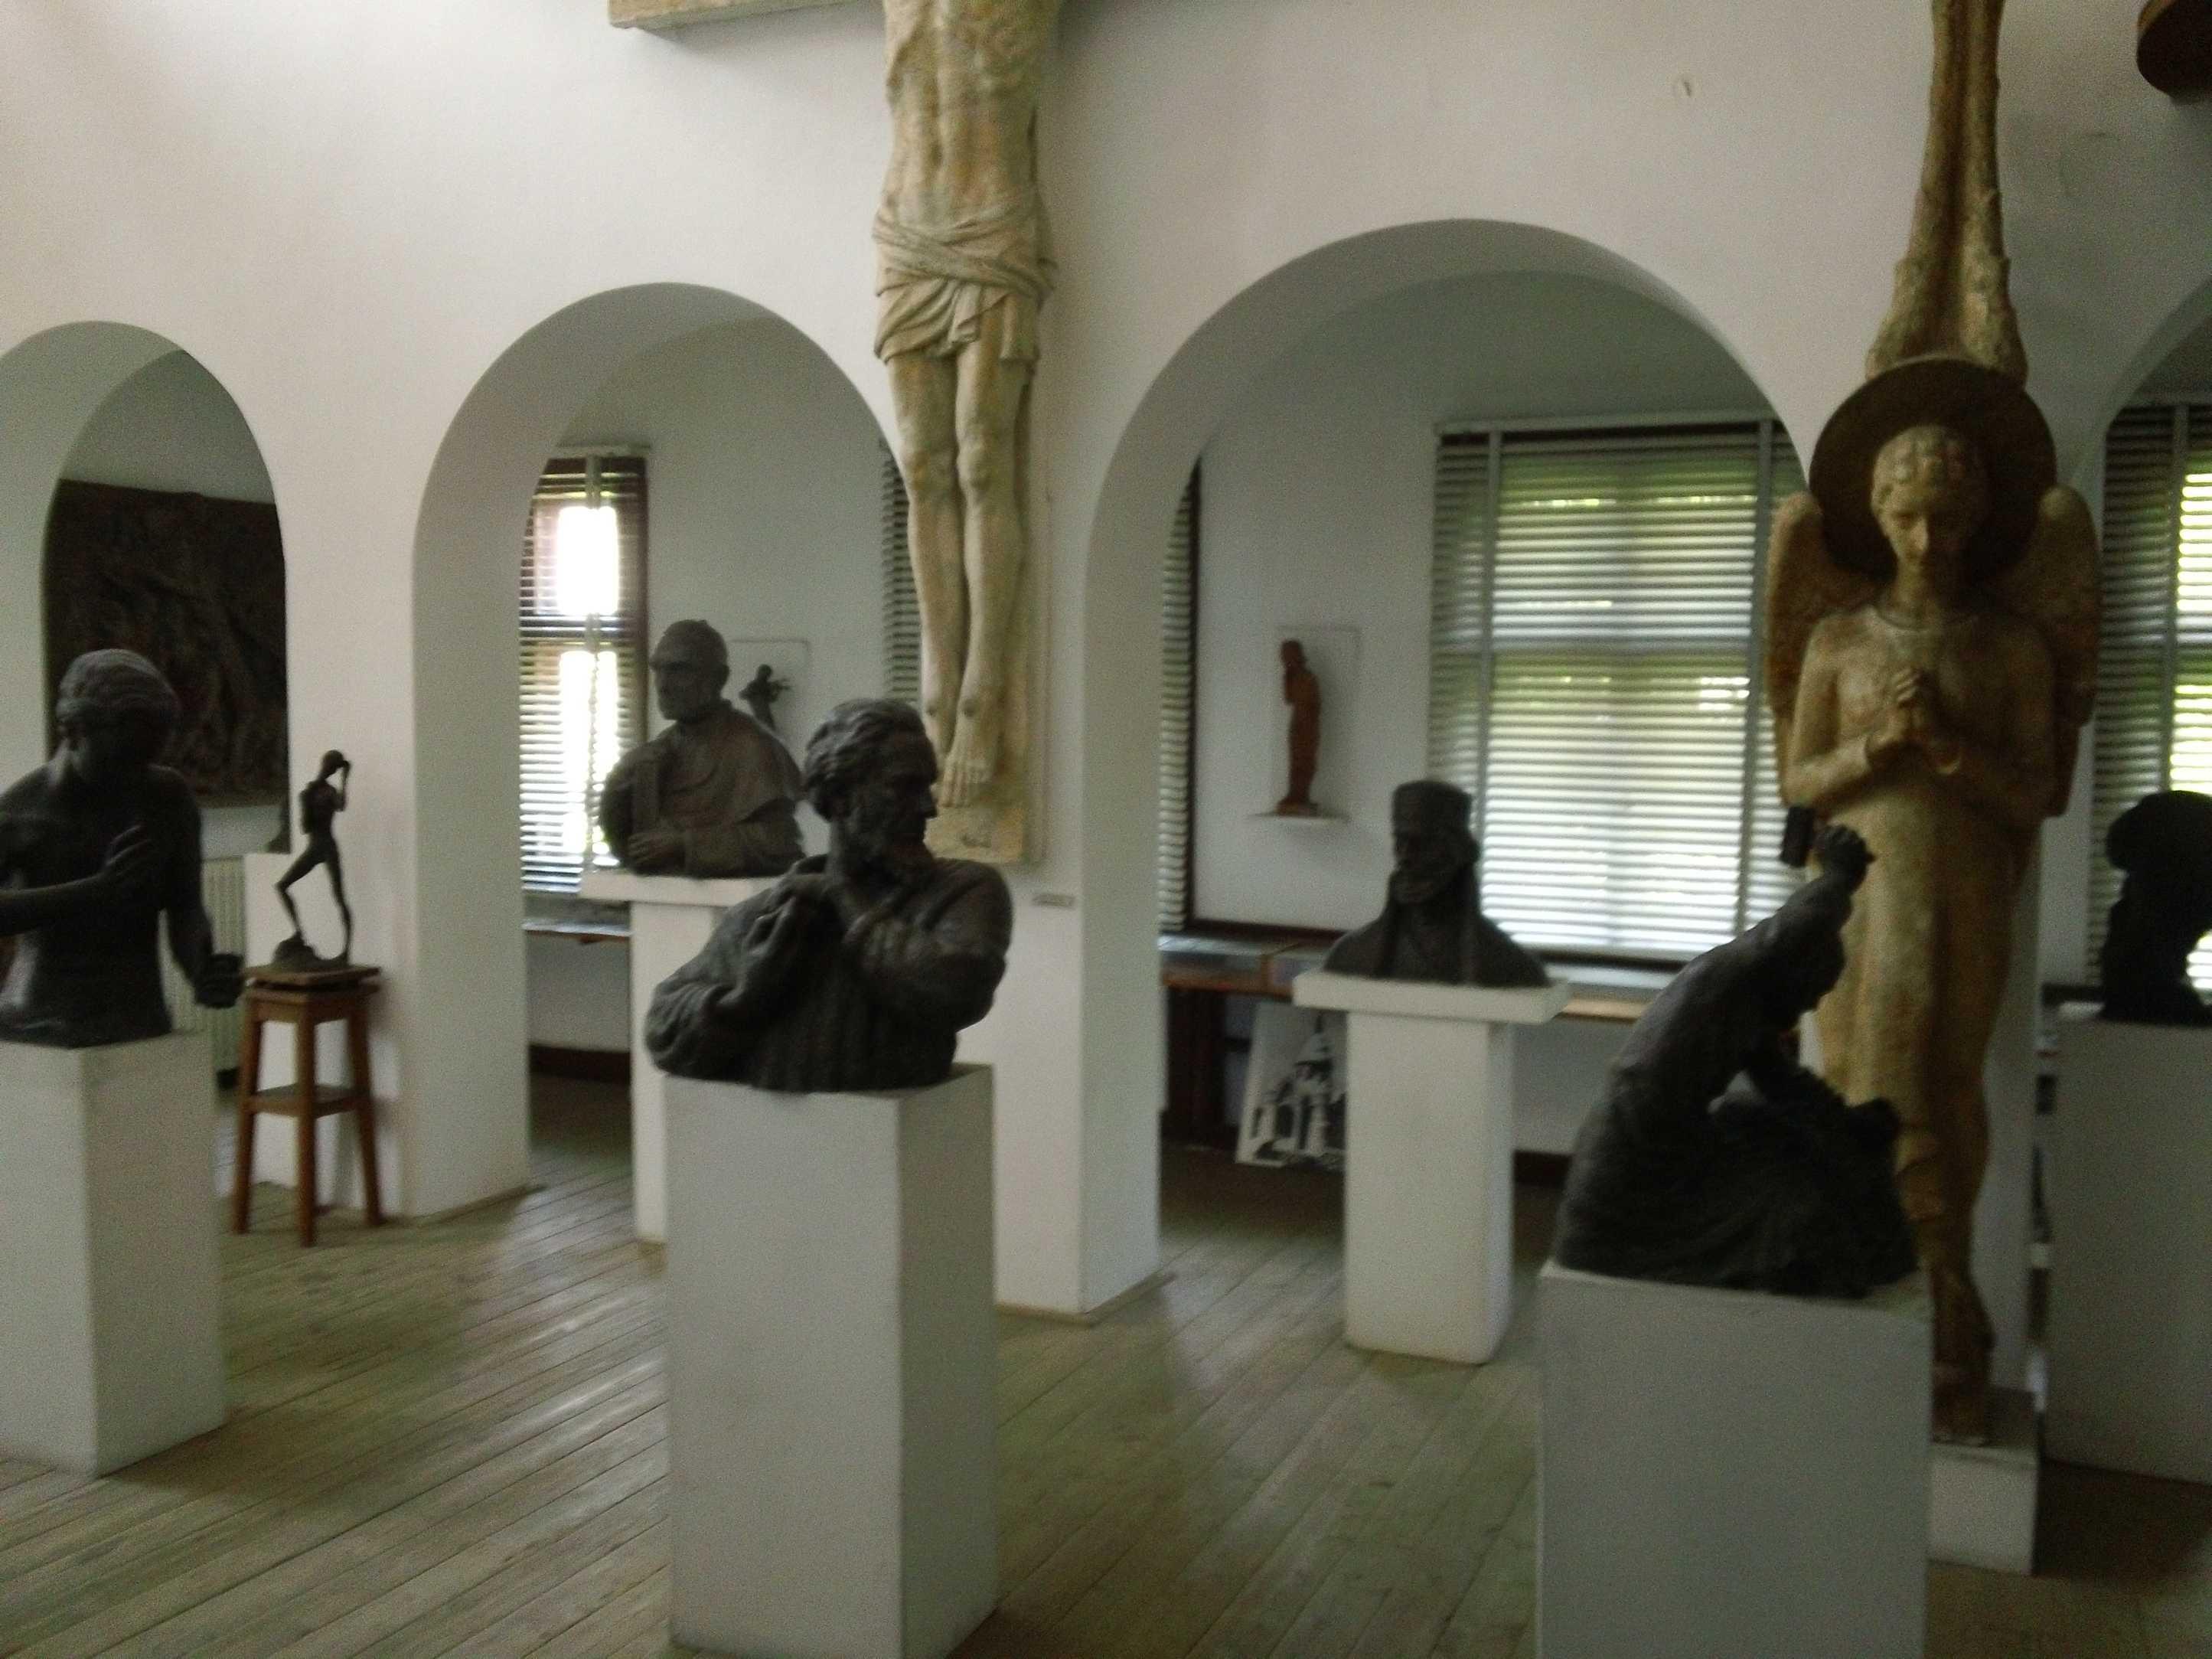 Muzej Tome Rosandića, Beograd, foto: L. Barna